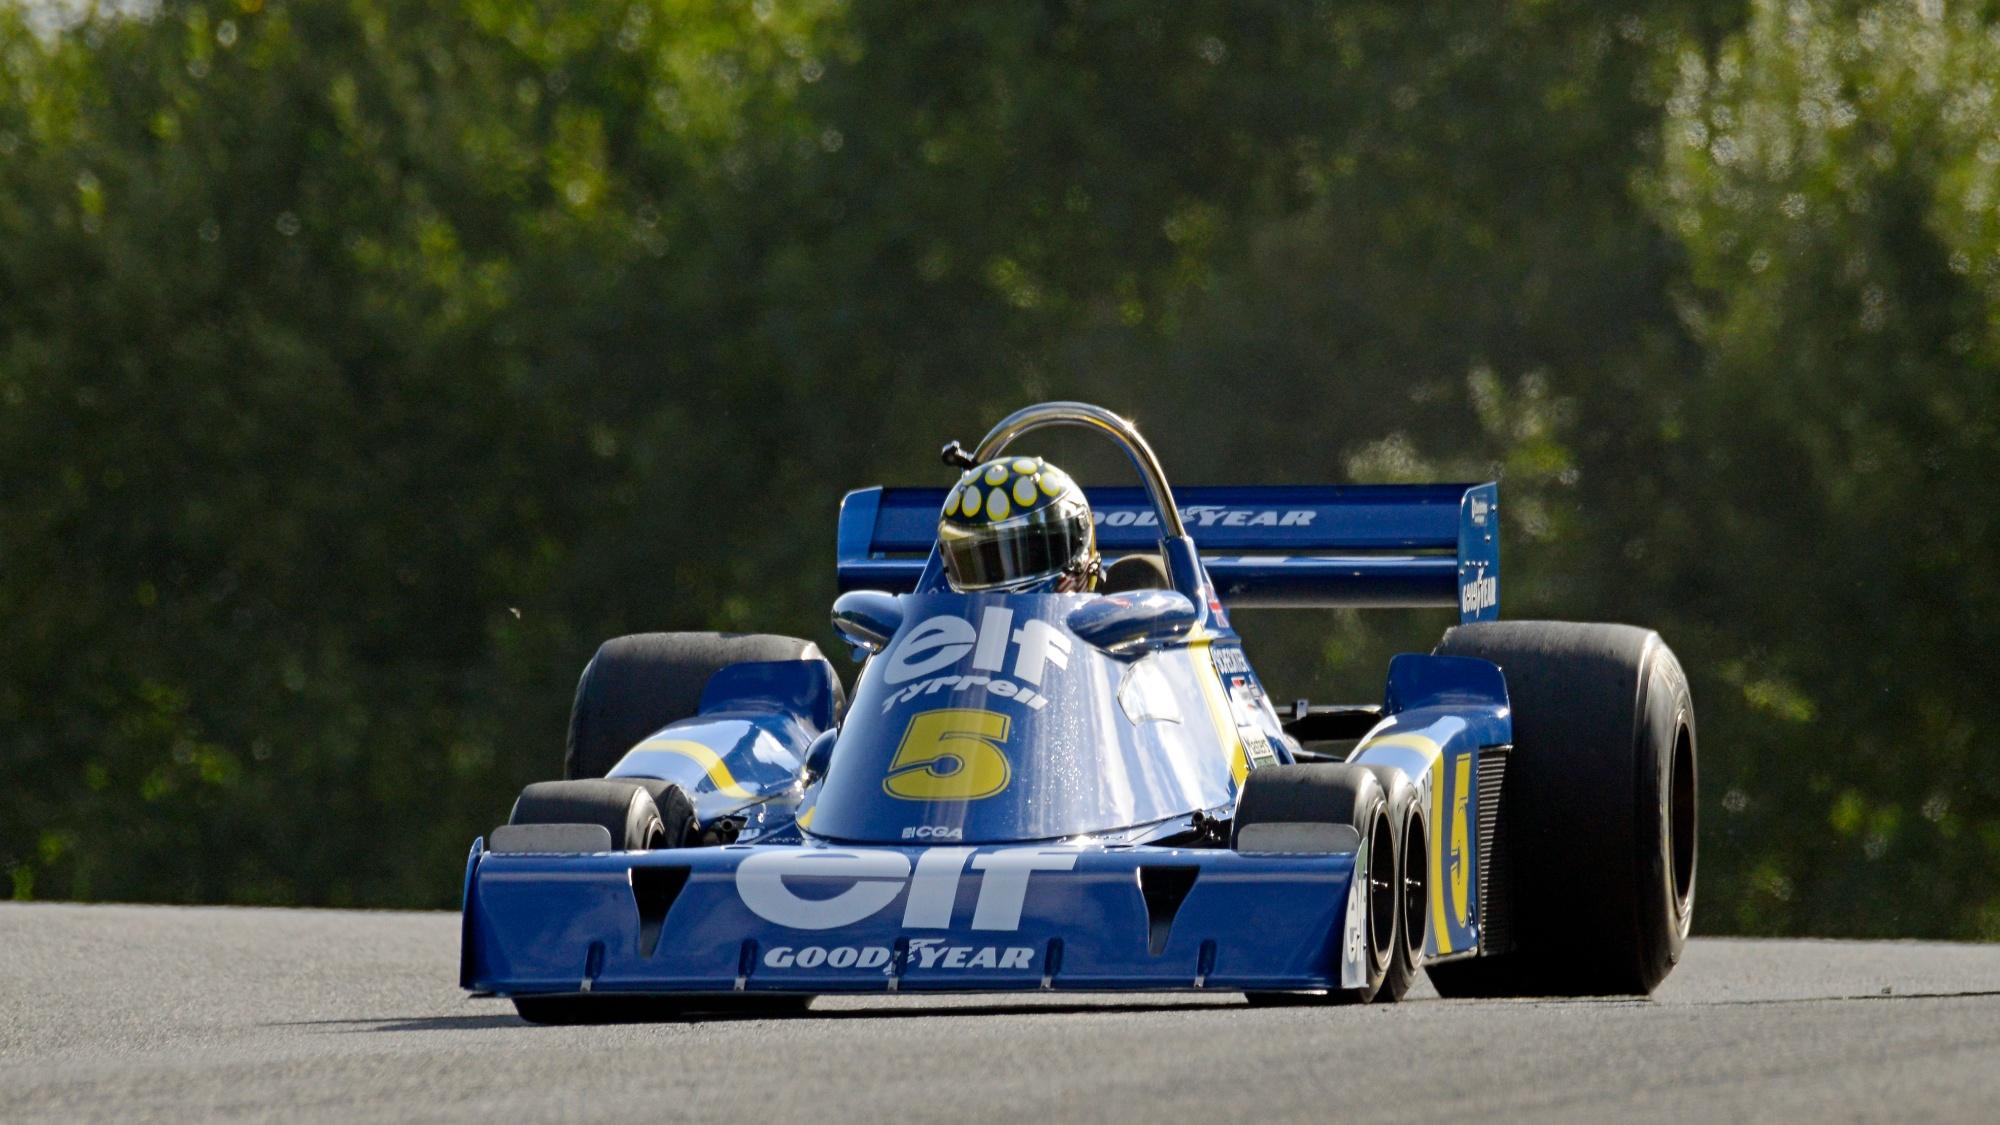 Tyrrell P34 continuation, Brands Hatch 2020